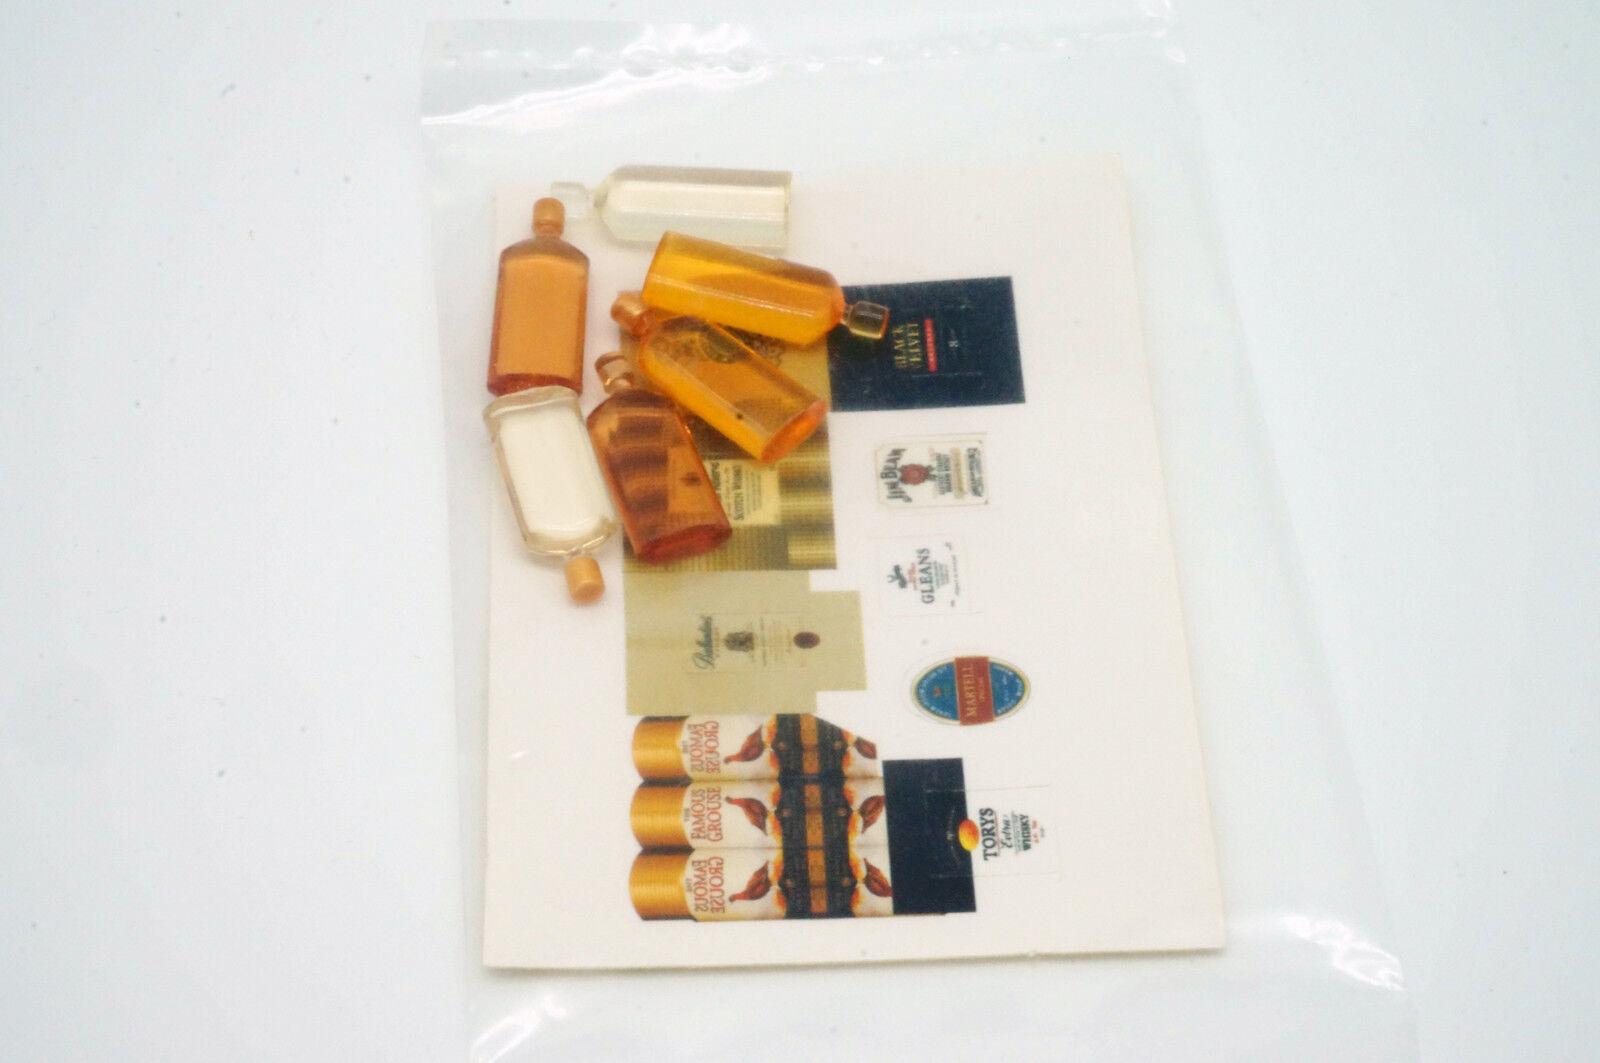 1:12 Mini`Goddess Statue For Miniature Dollhouse Accessory Home Decor DIY Gif BH